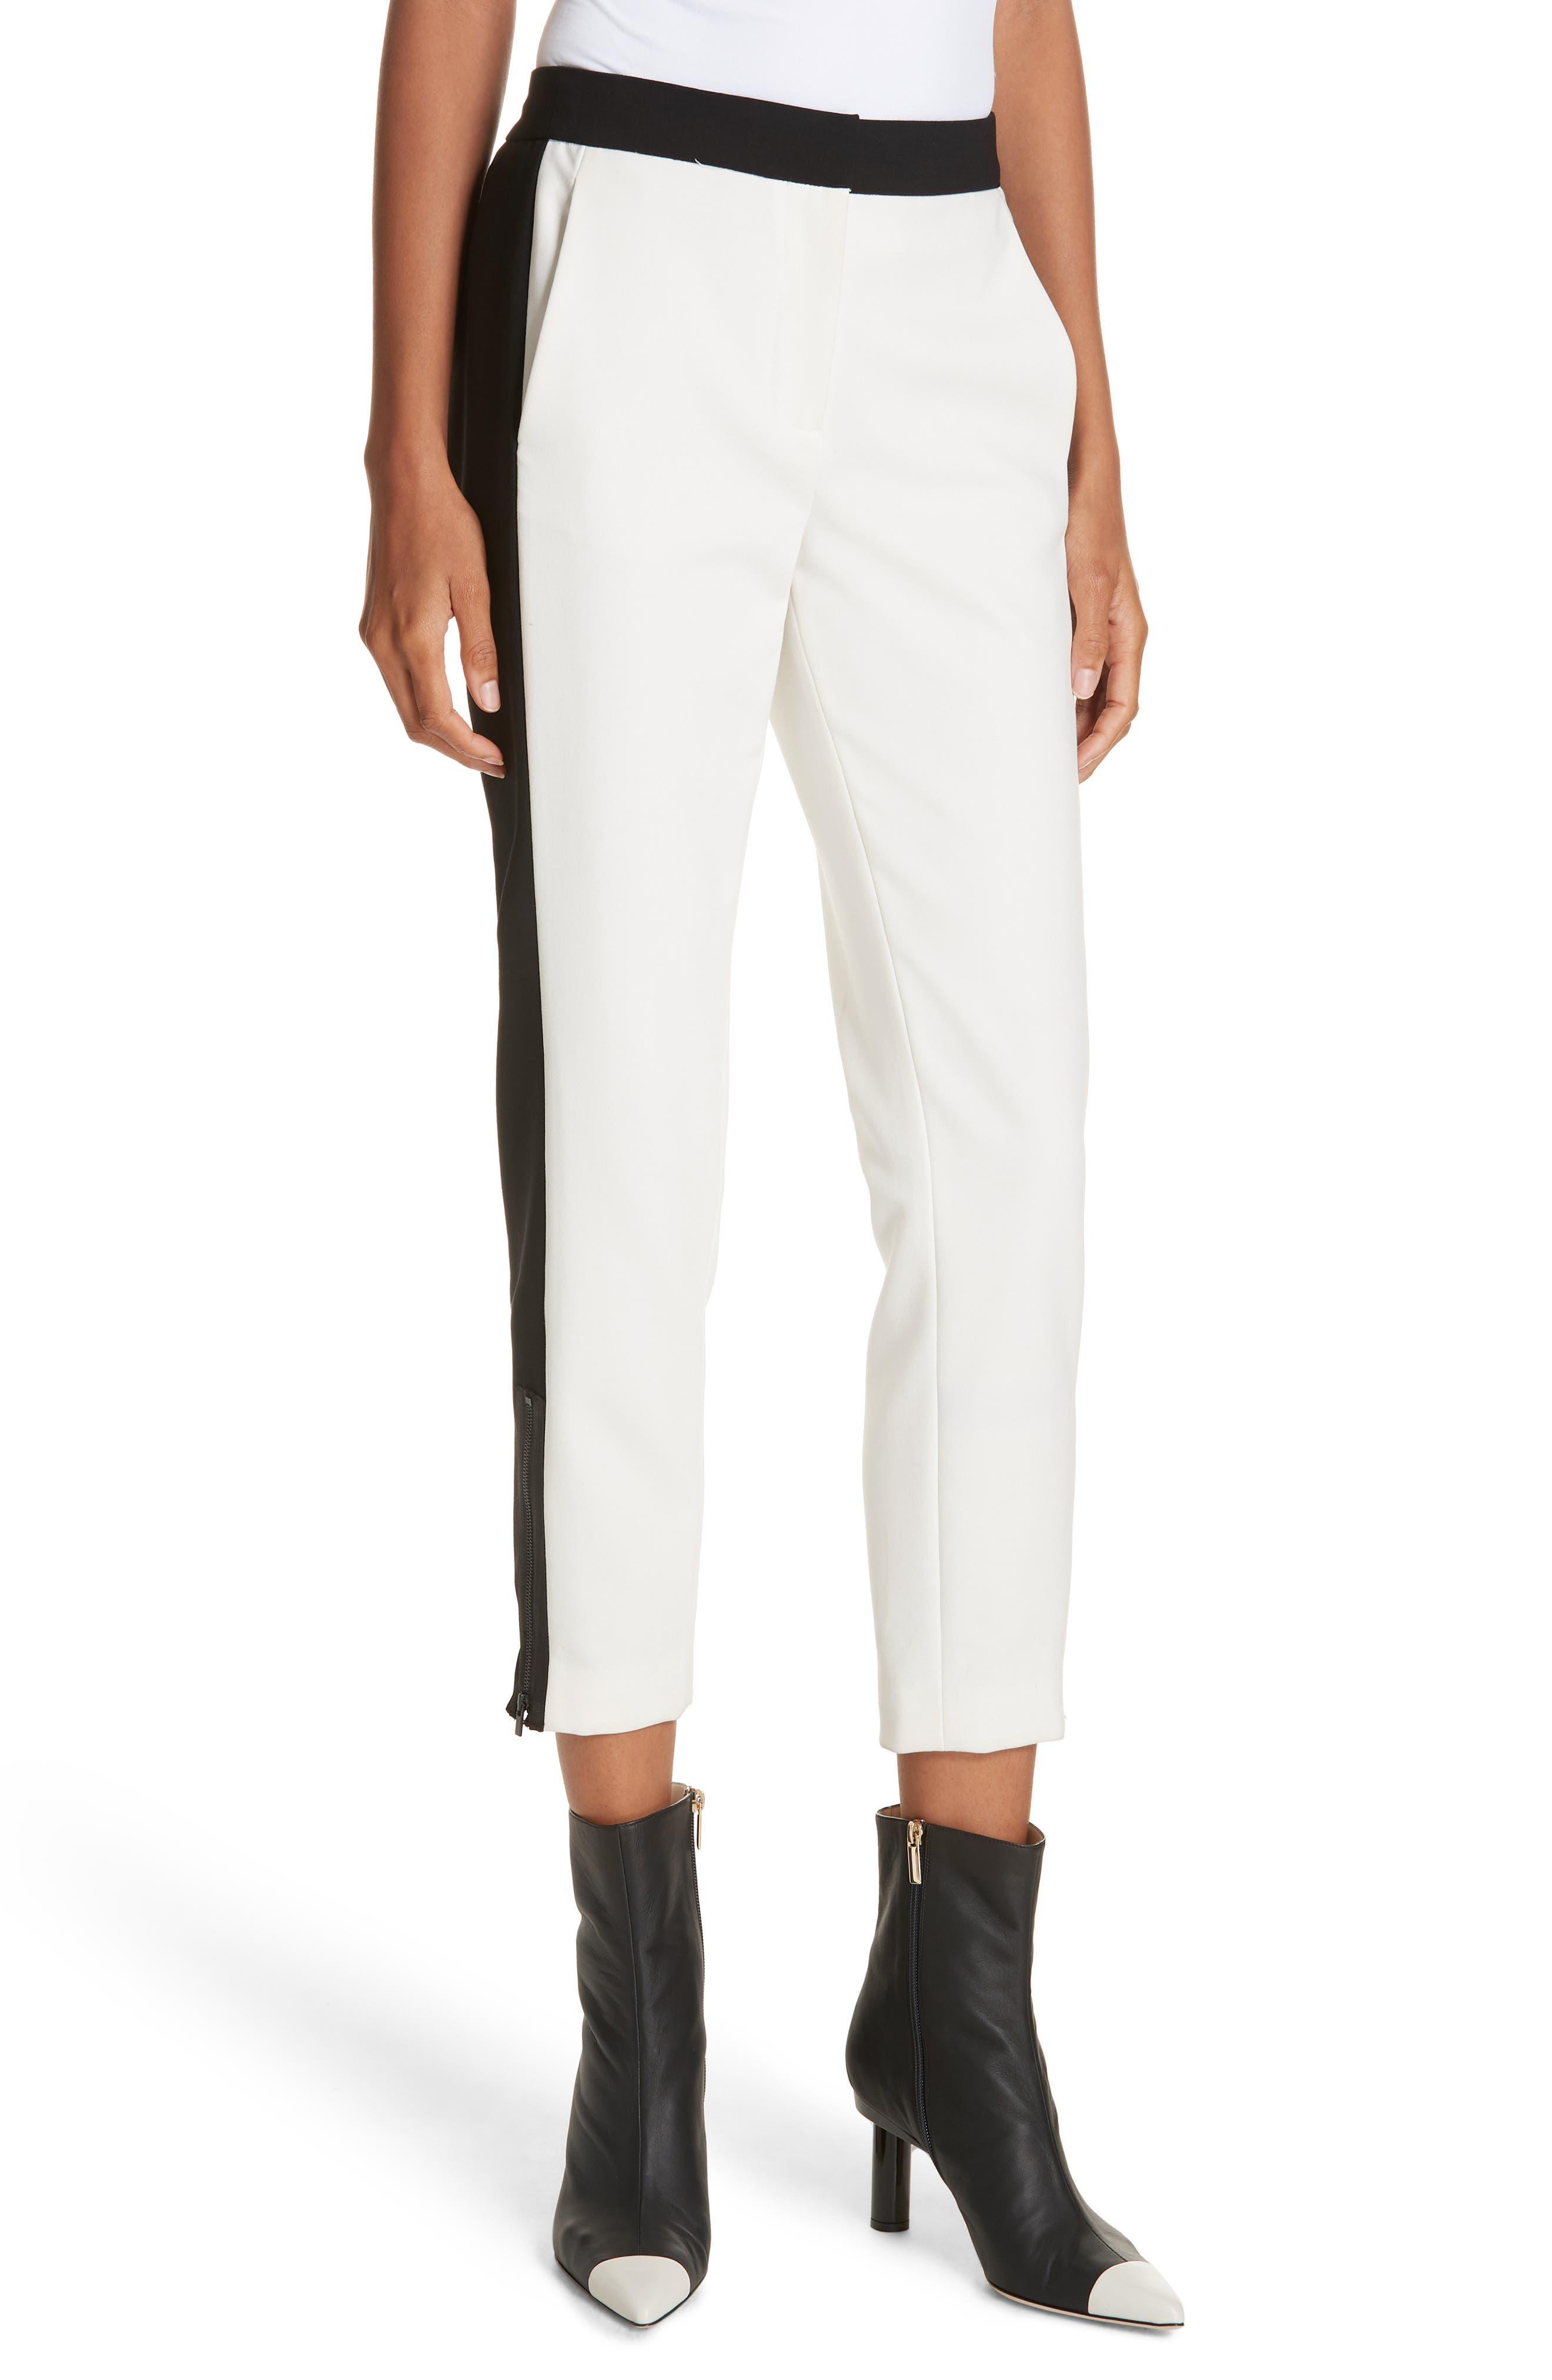 Anson Tuxedo Skinny Pants,                         Main,                         color, IVORY MULTI